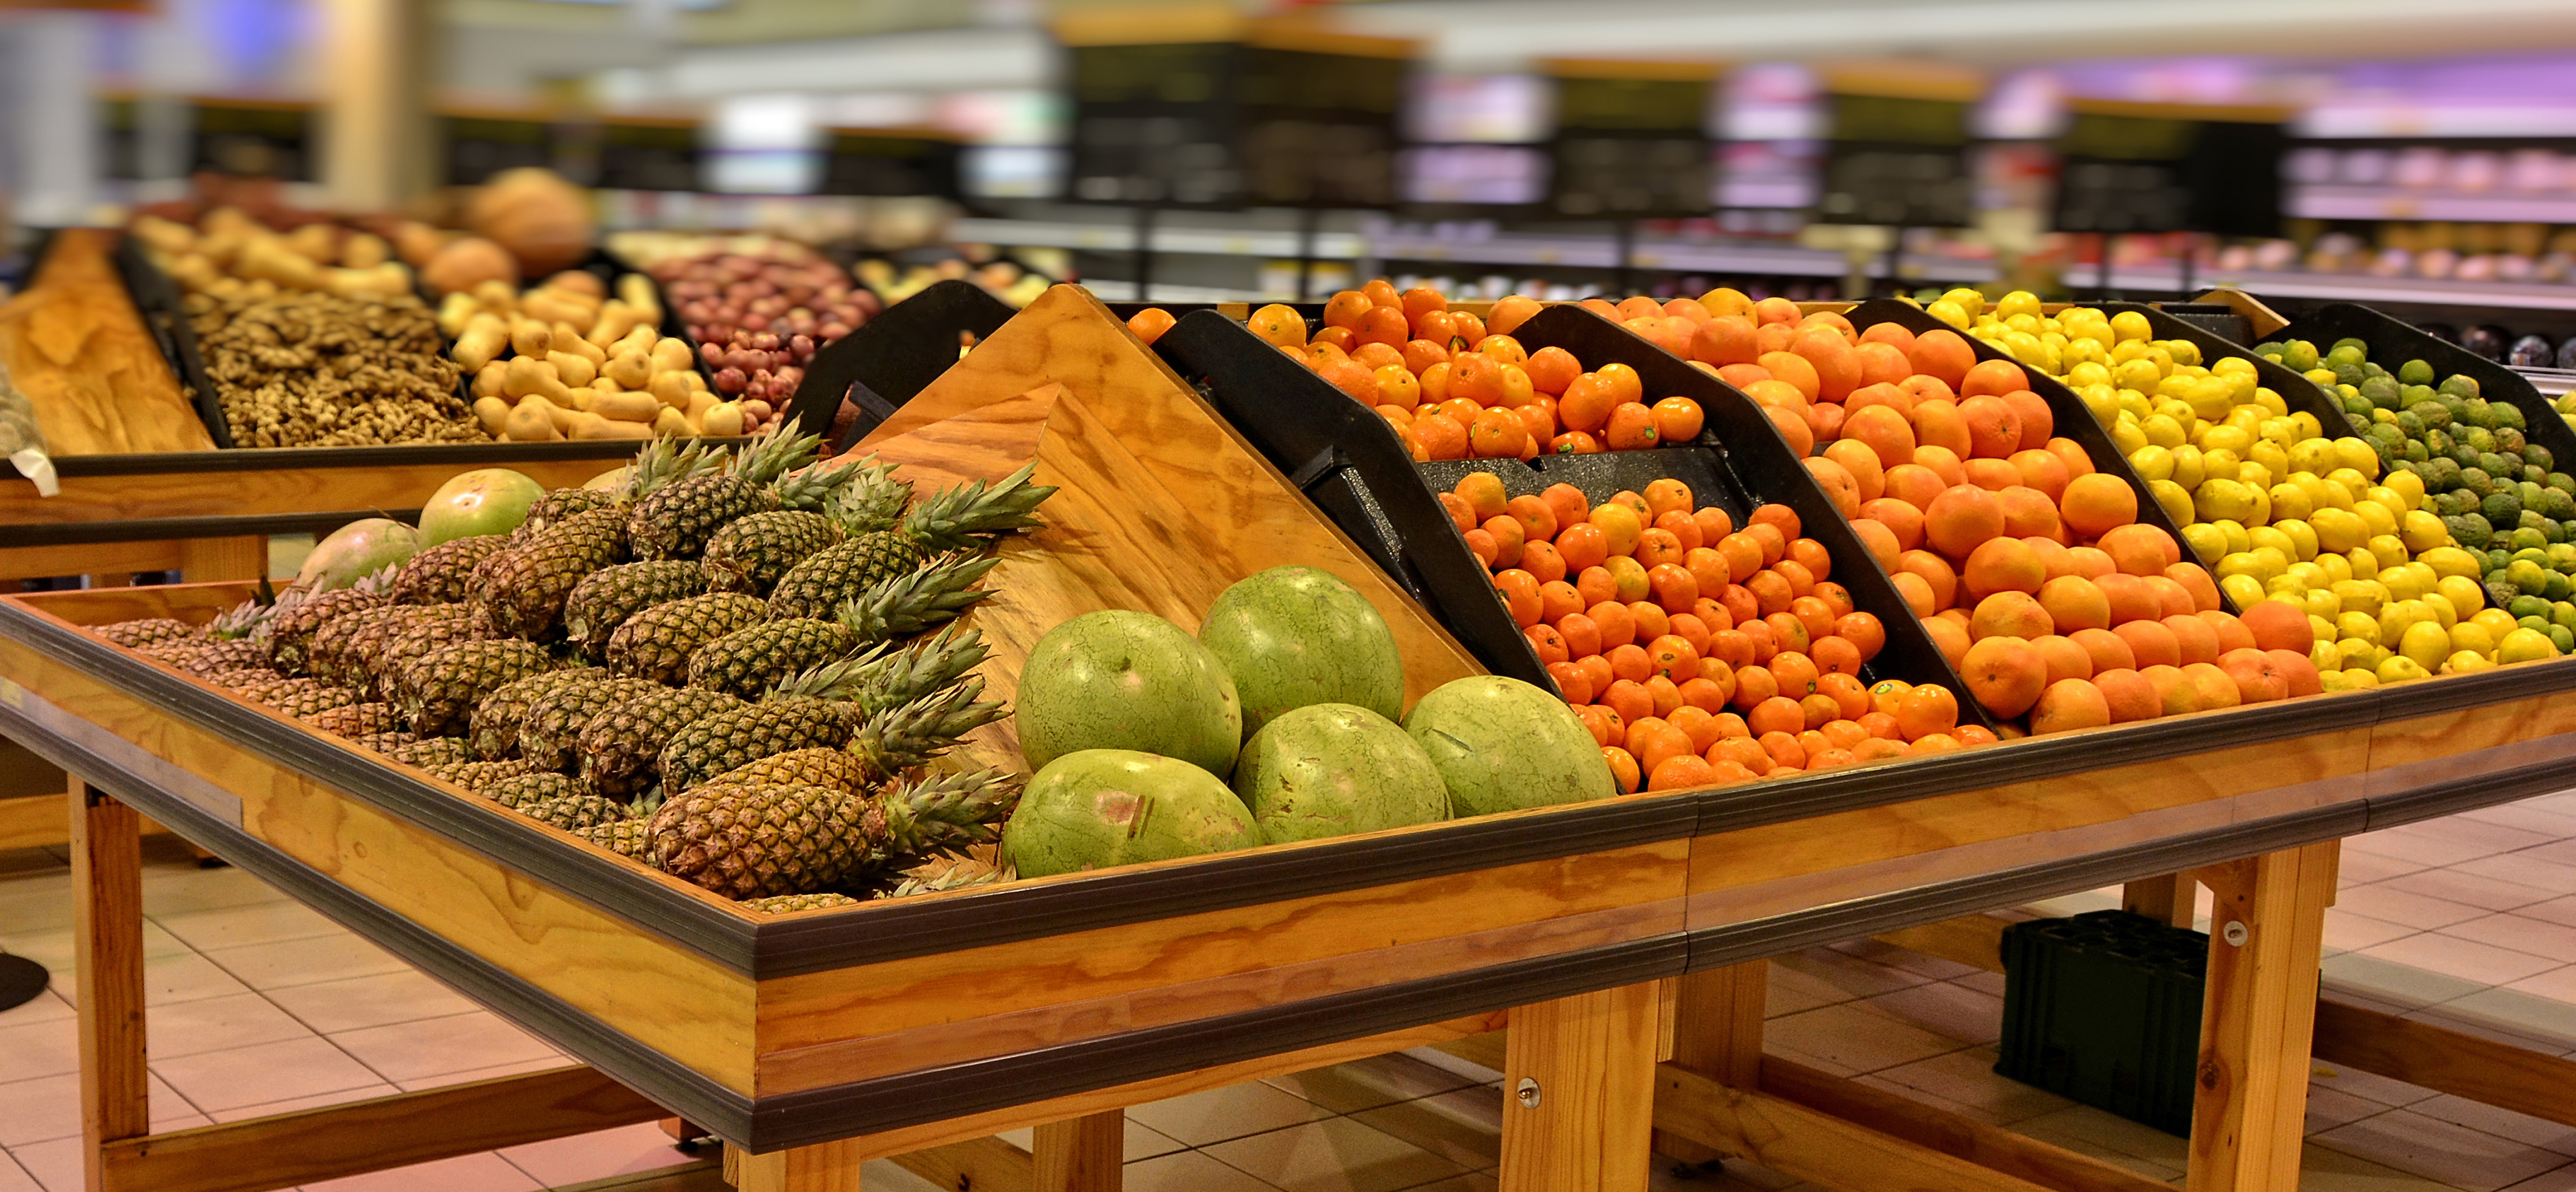 Food retail service and hospitality libya - Bureau veritas head office ...